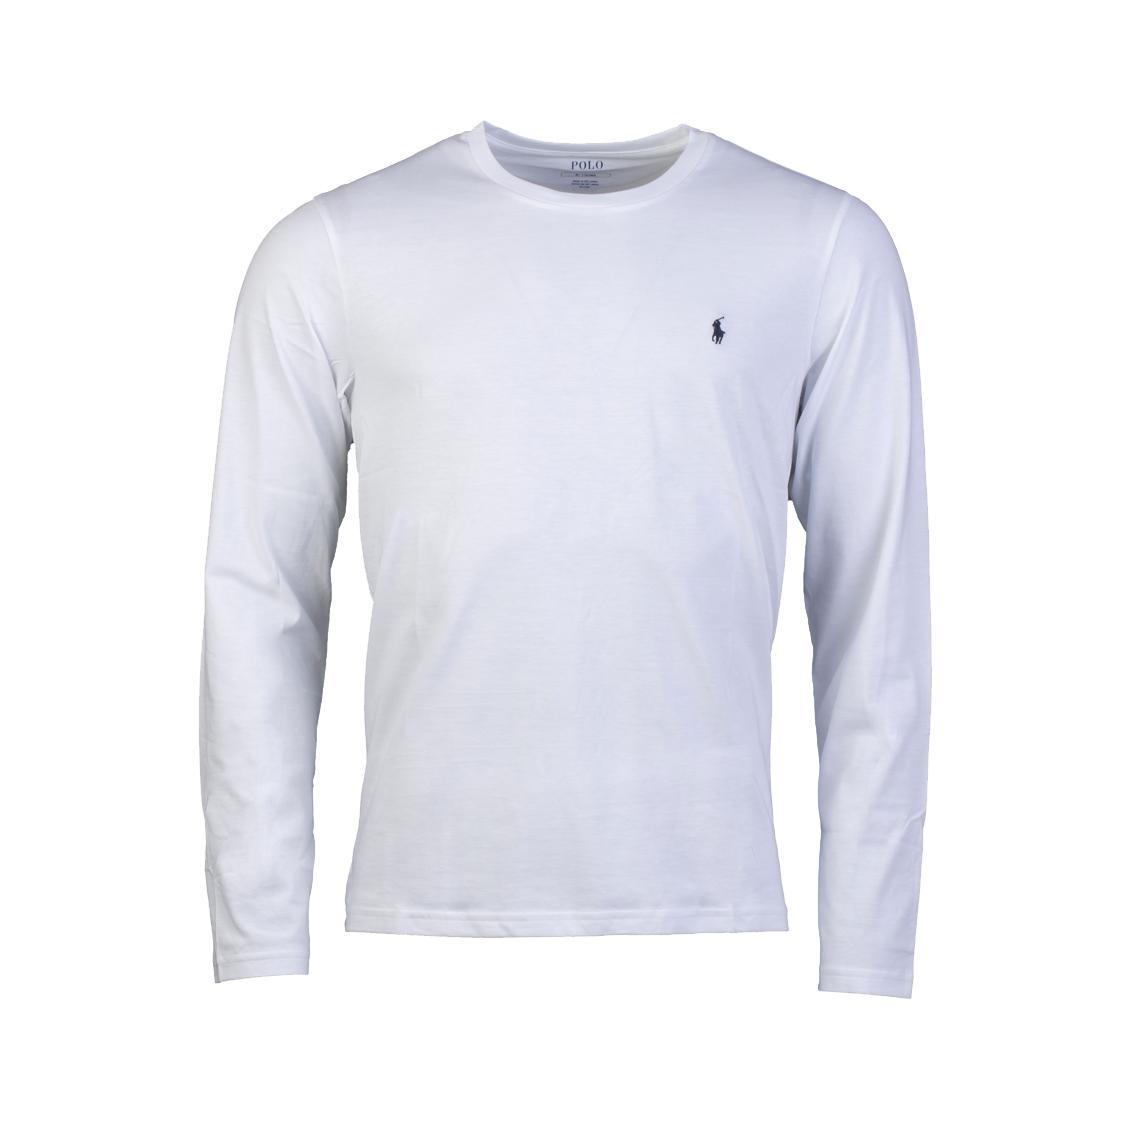 Tee-shirt manches longues col rond  en coton blanc brodé